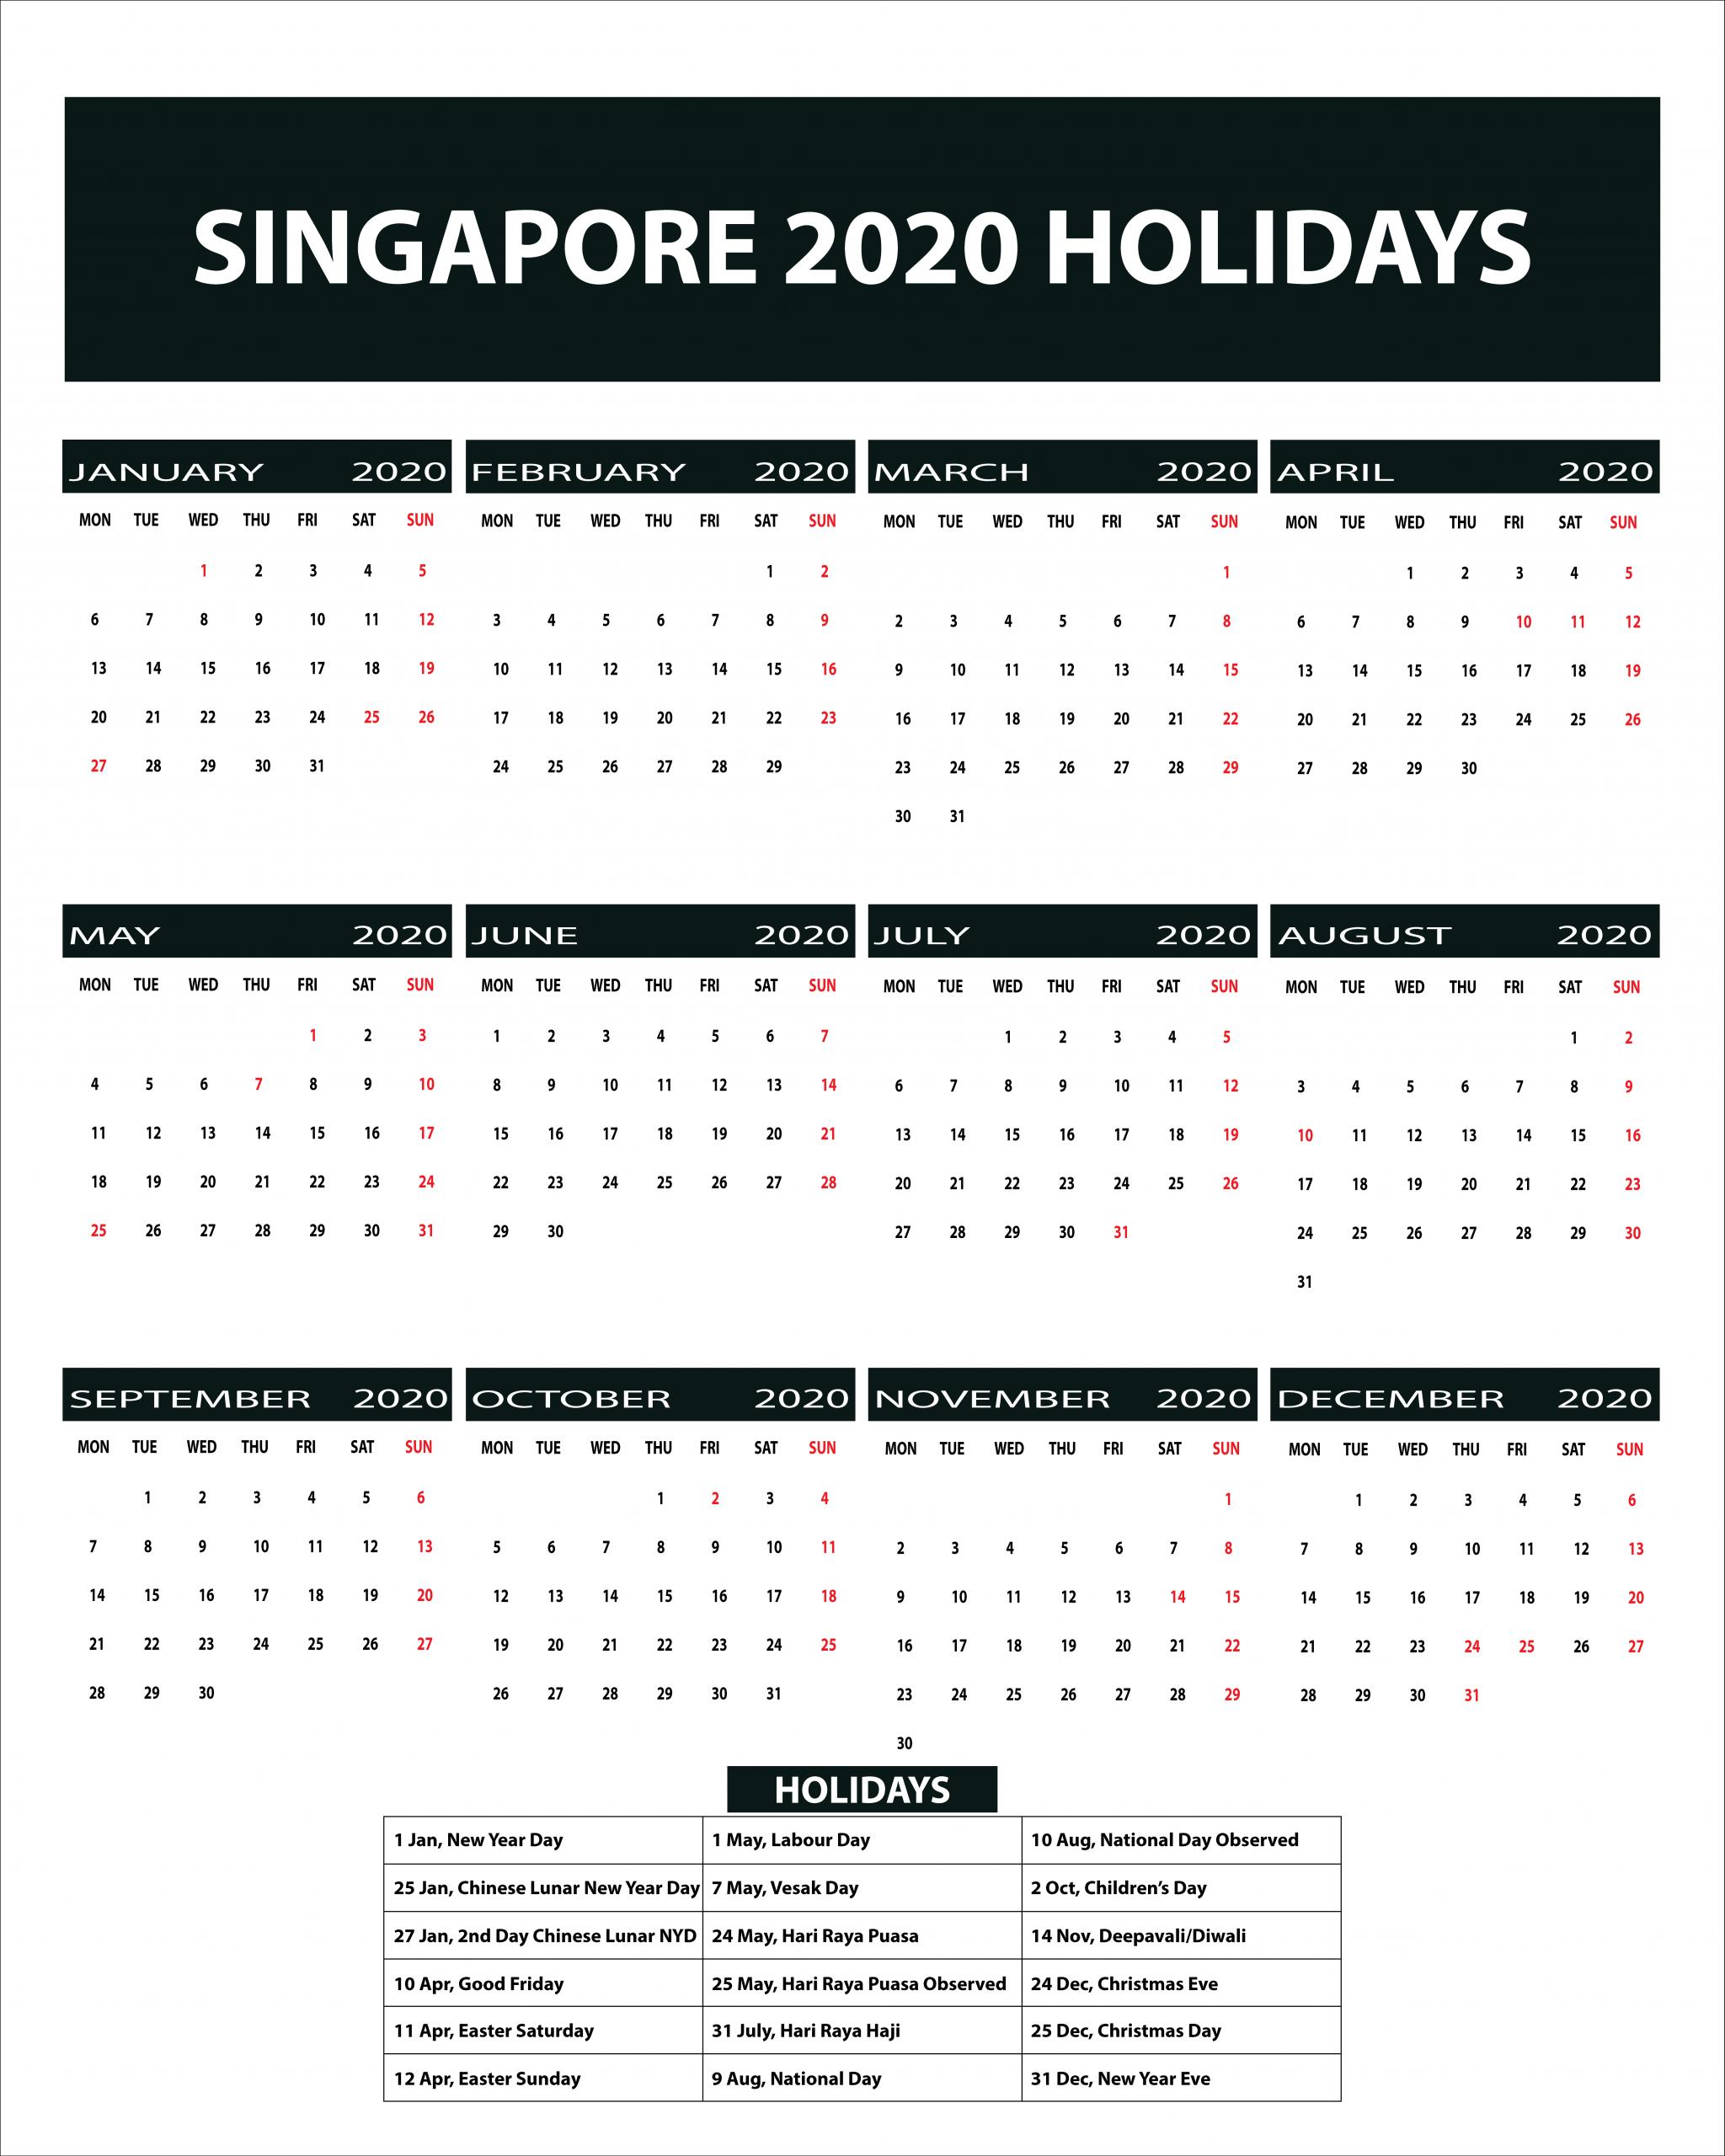 Free Blank Printable Singapore Public Holidays 2020 Calendar